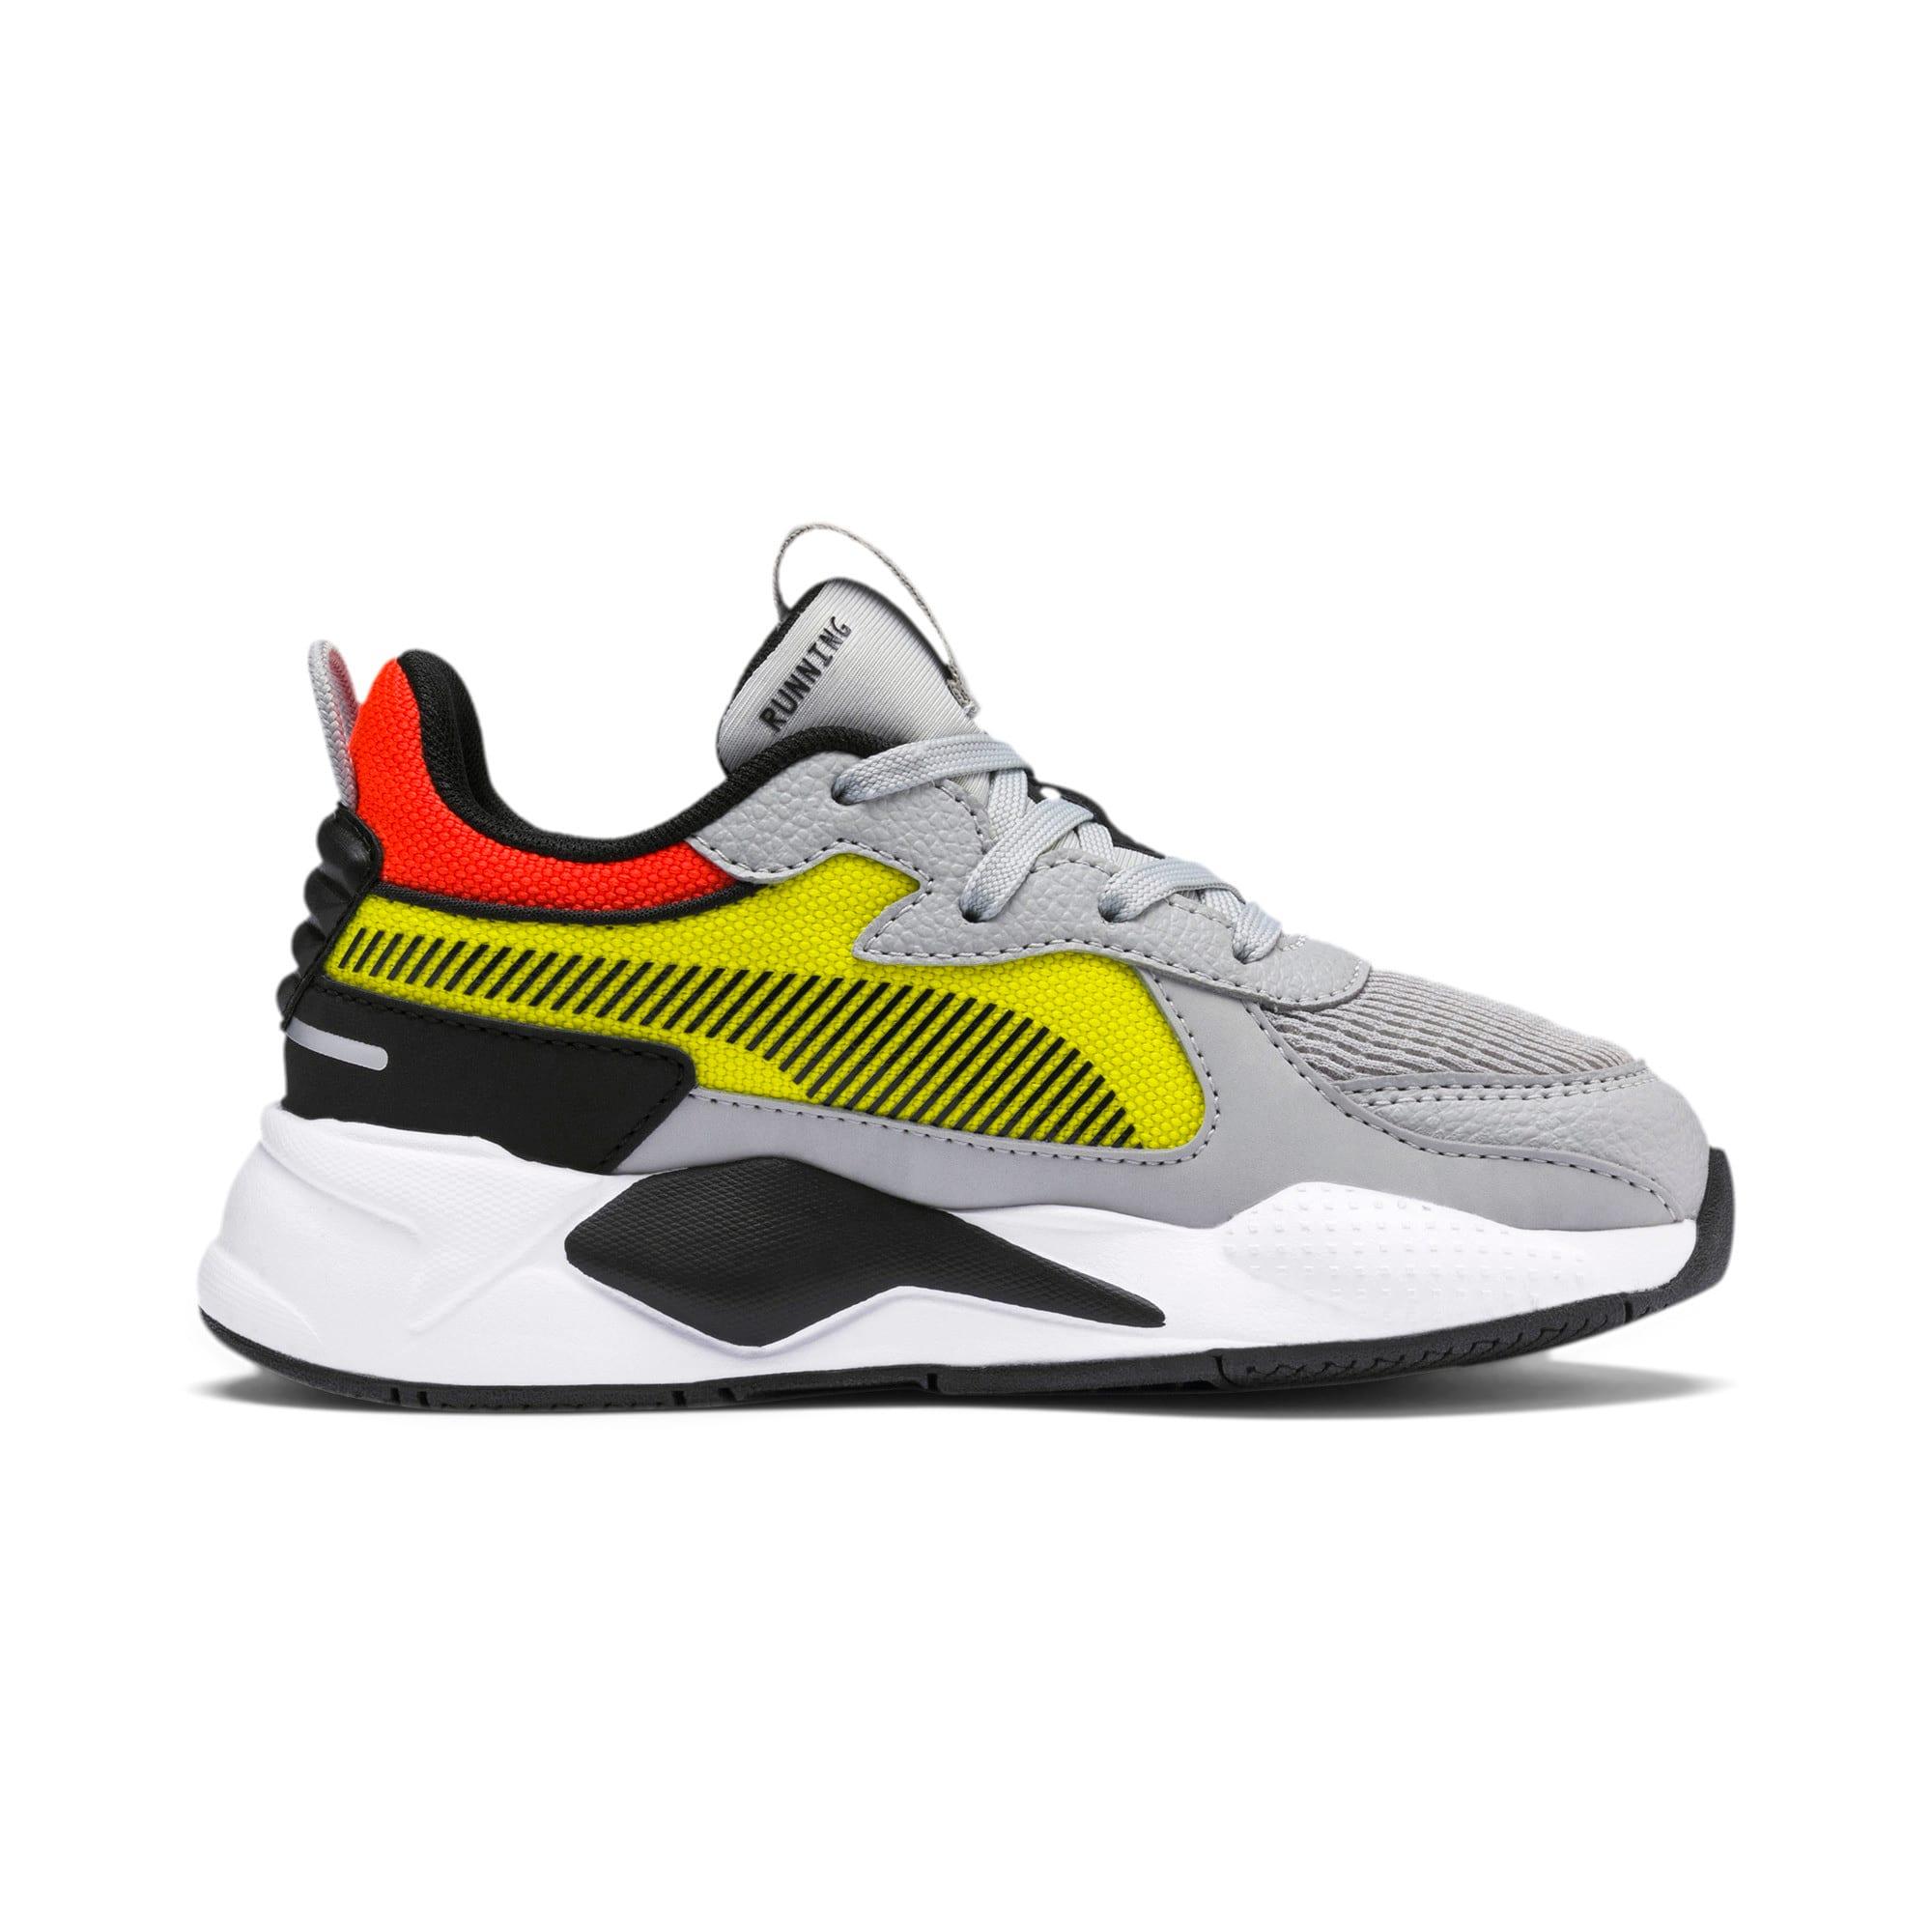 Miniatura 5 de Zapatos RS-X Hard Drive para niño pequeño, High Rise-Yellow Alert, mediano